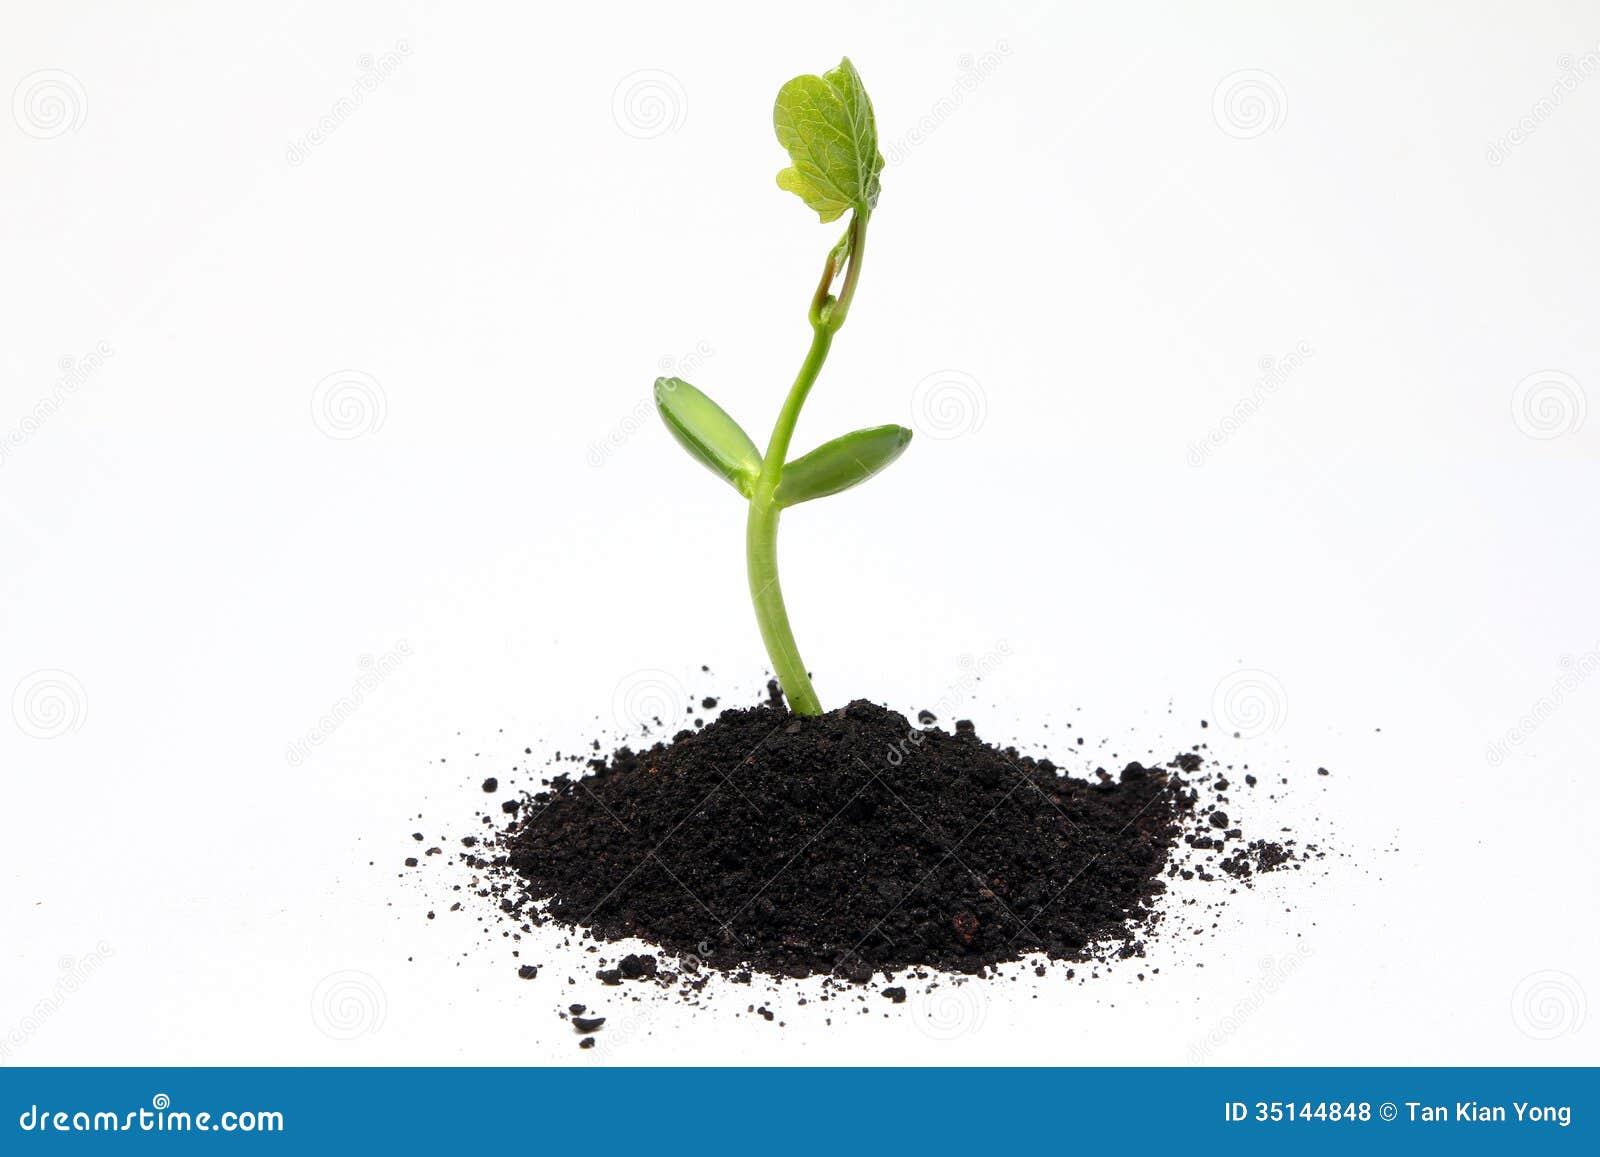 Fertilizers in organic farming